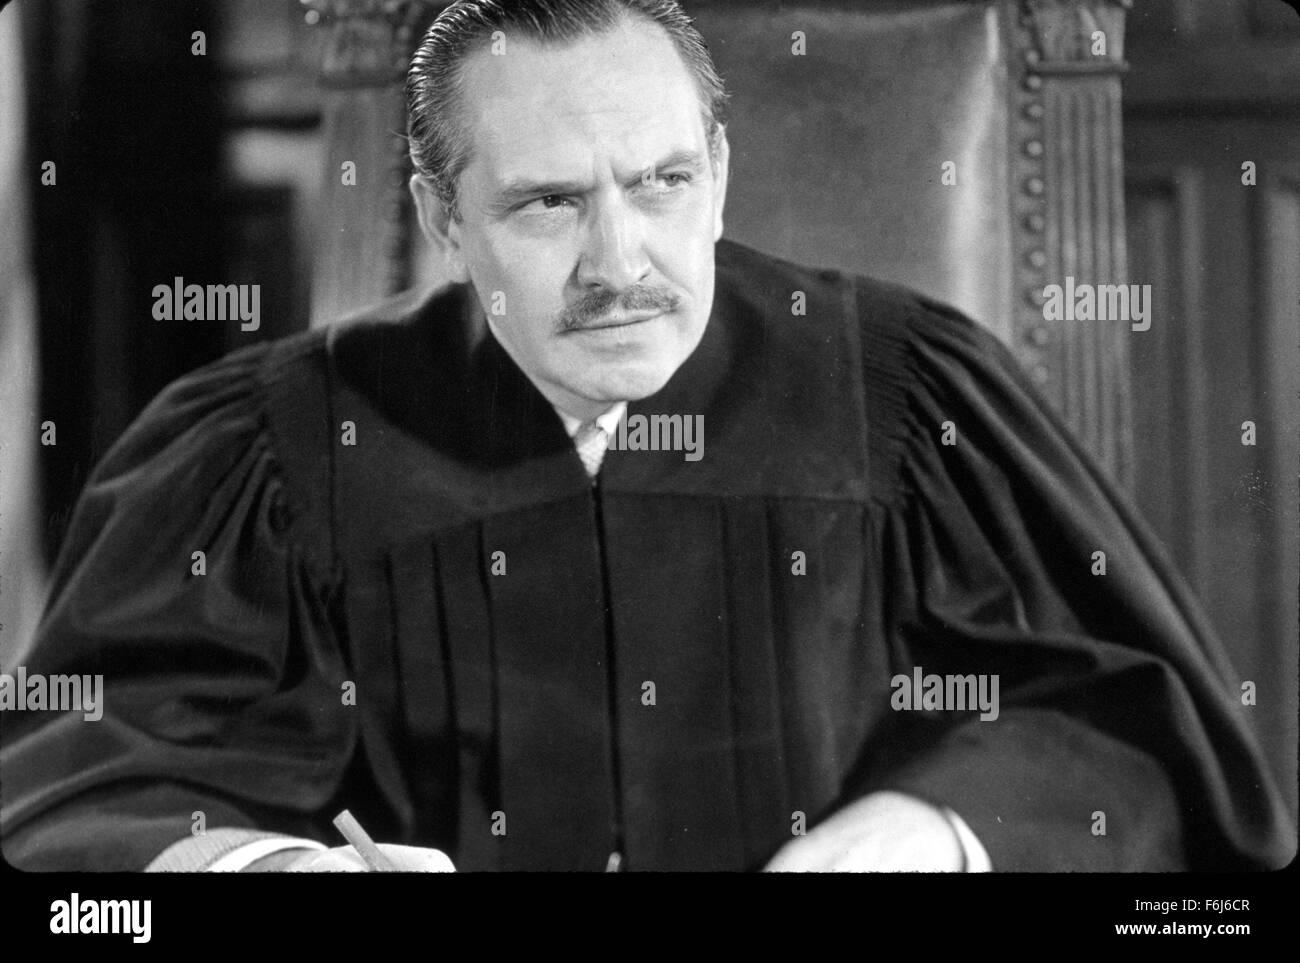 michael gordon stock photos michael gordon stock images alamy 1948 film title act of murder director michael gordon studio